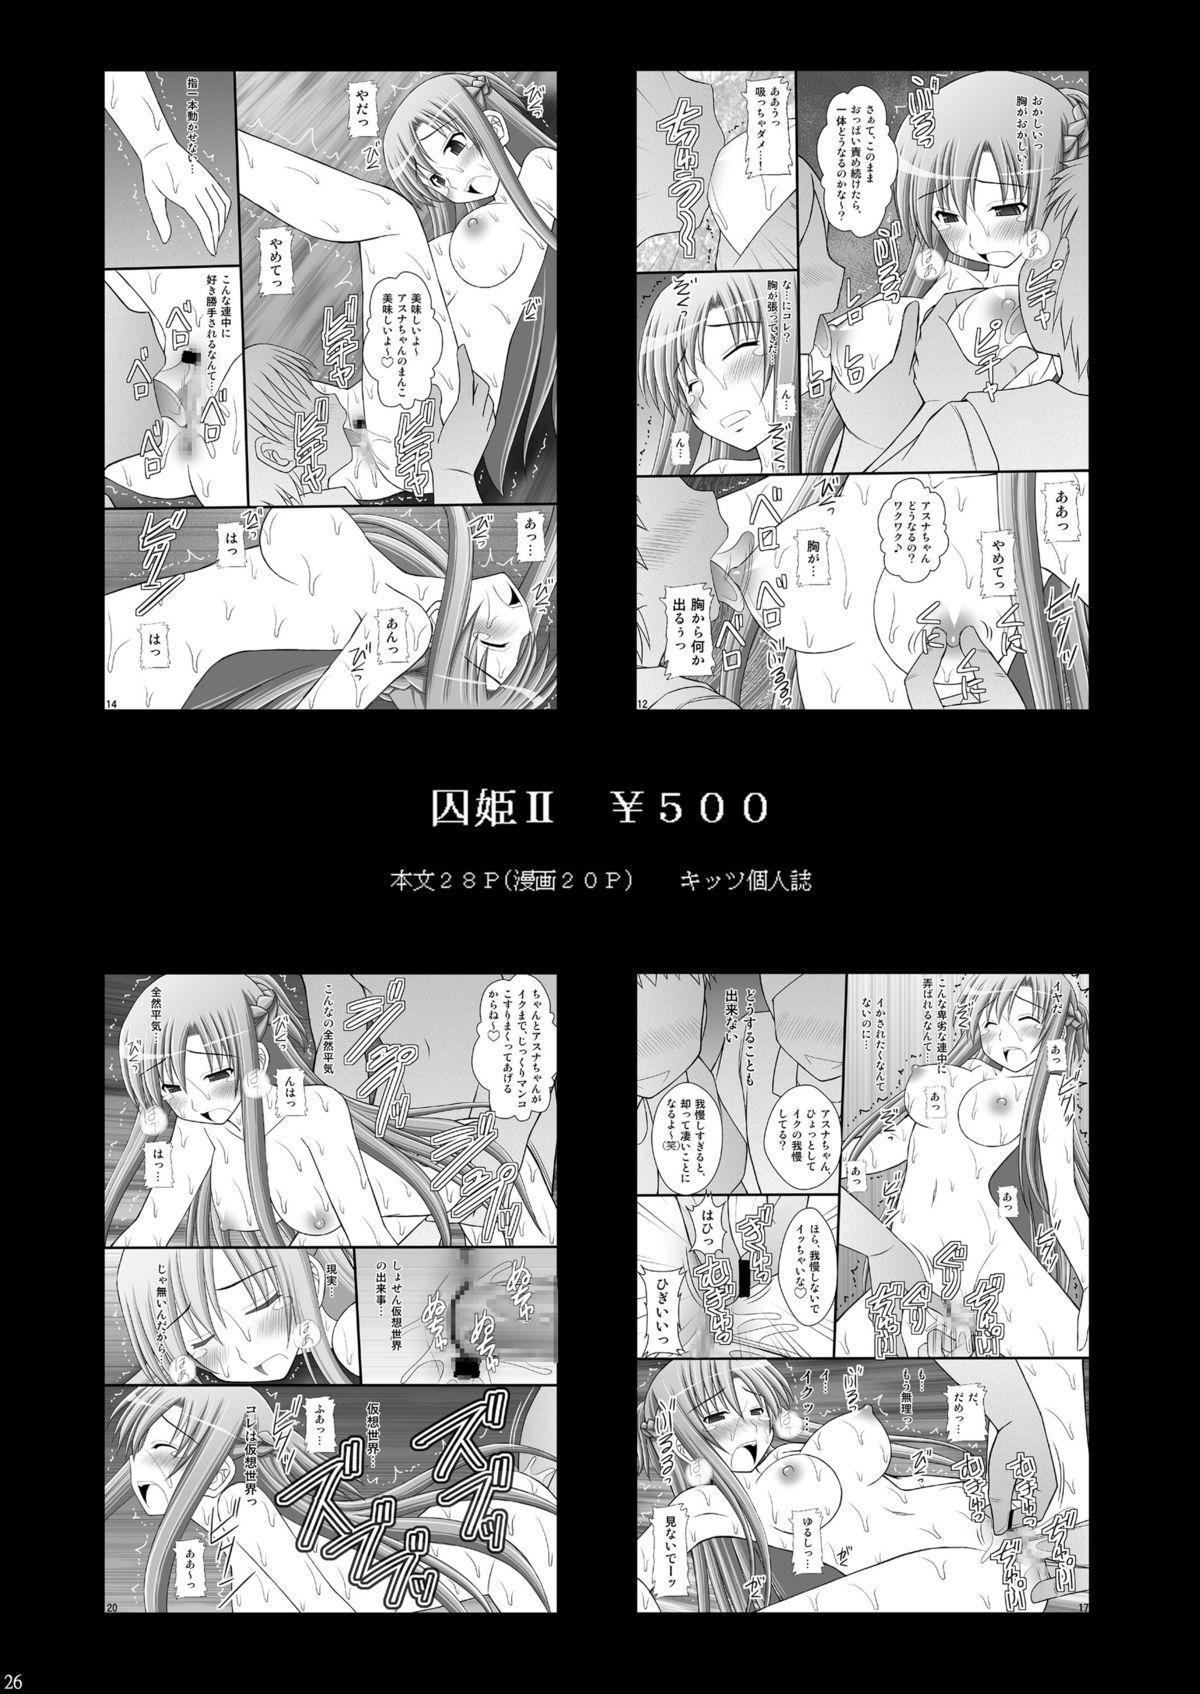 Toraware Hime III: Hostage Princess III 24